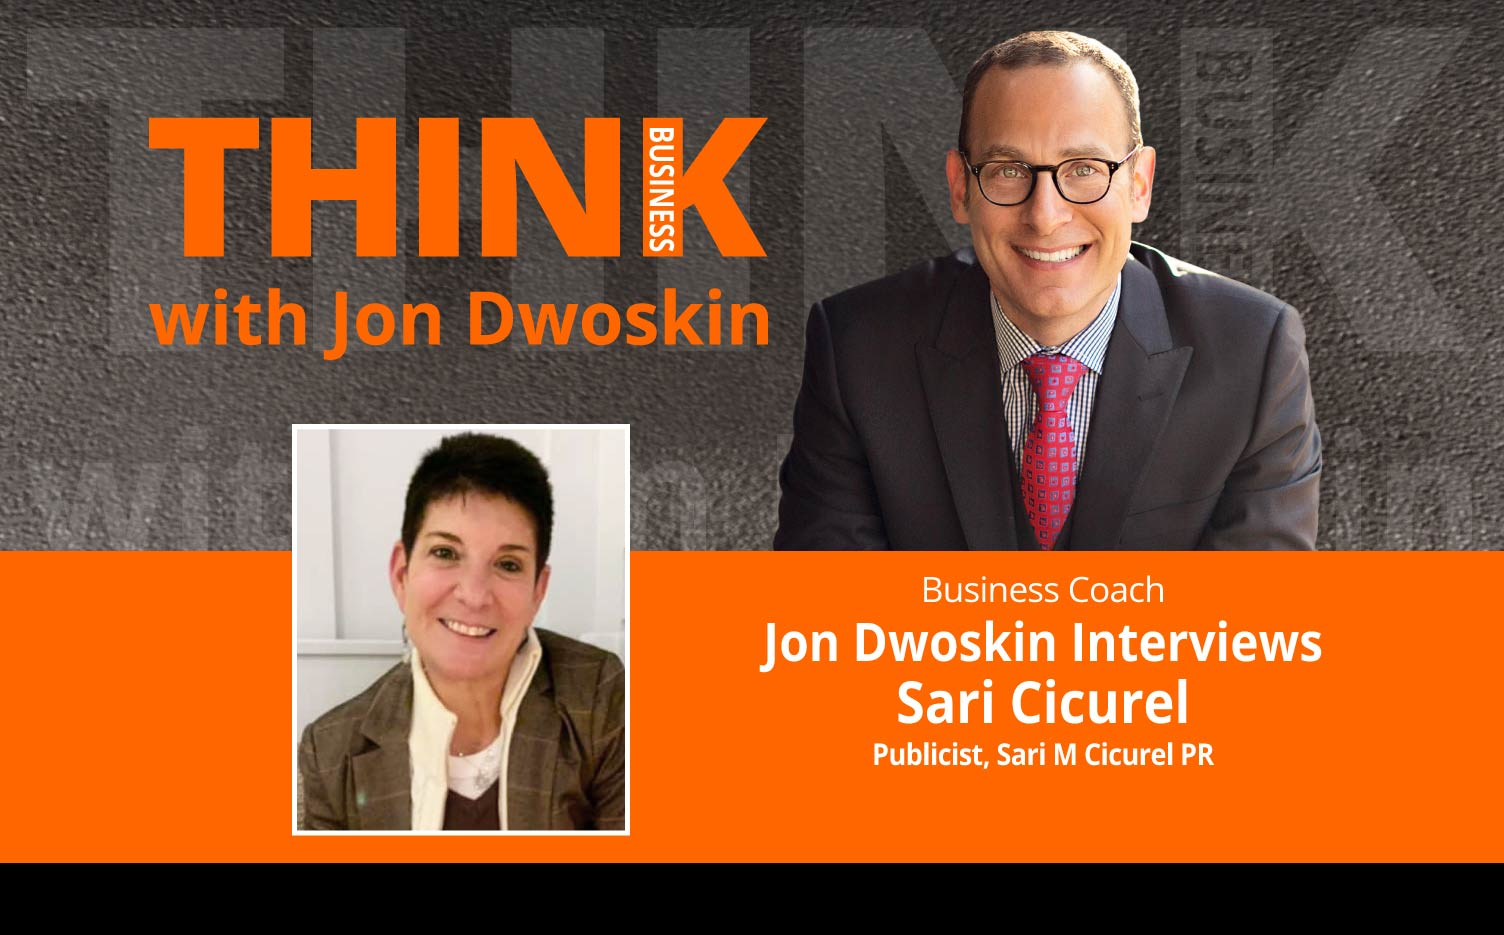 THINK Business Podcast: Jon Dwoskin Interviews Sari Cicurel, Publicist, Sari M Cicurel PR